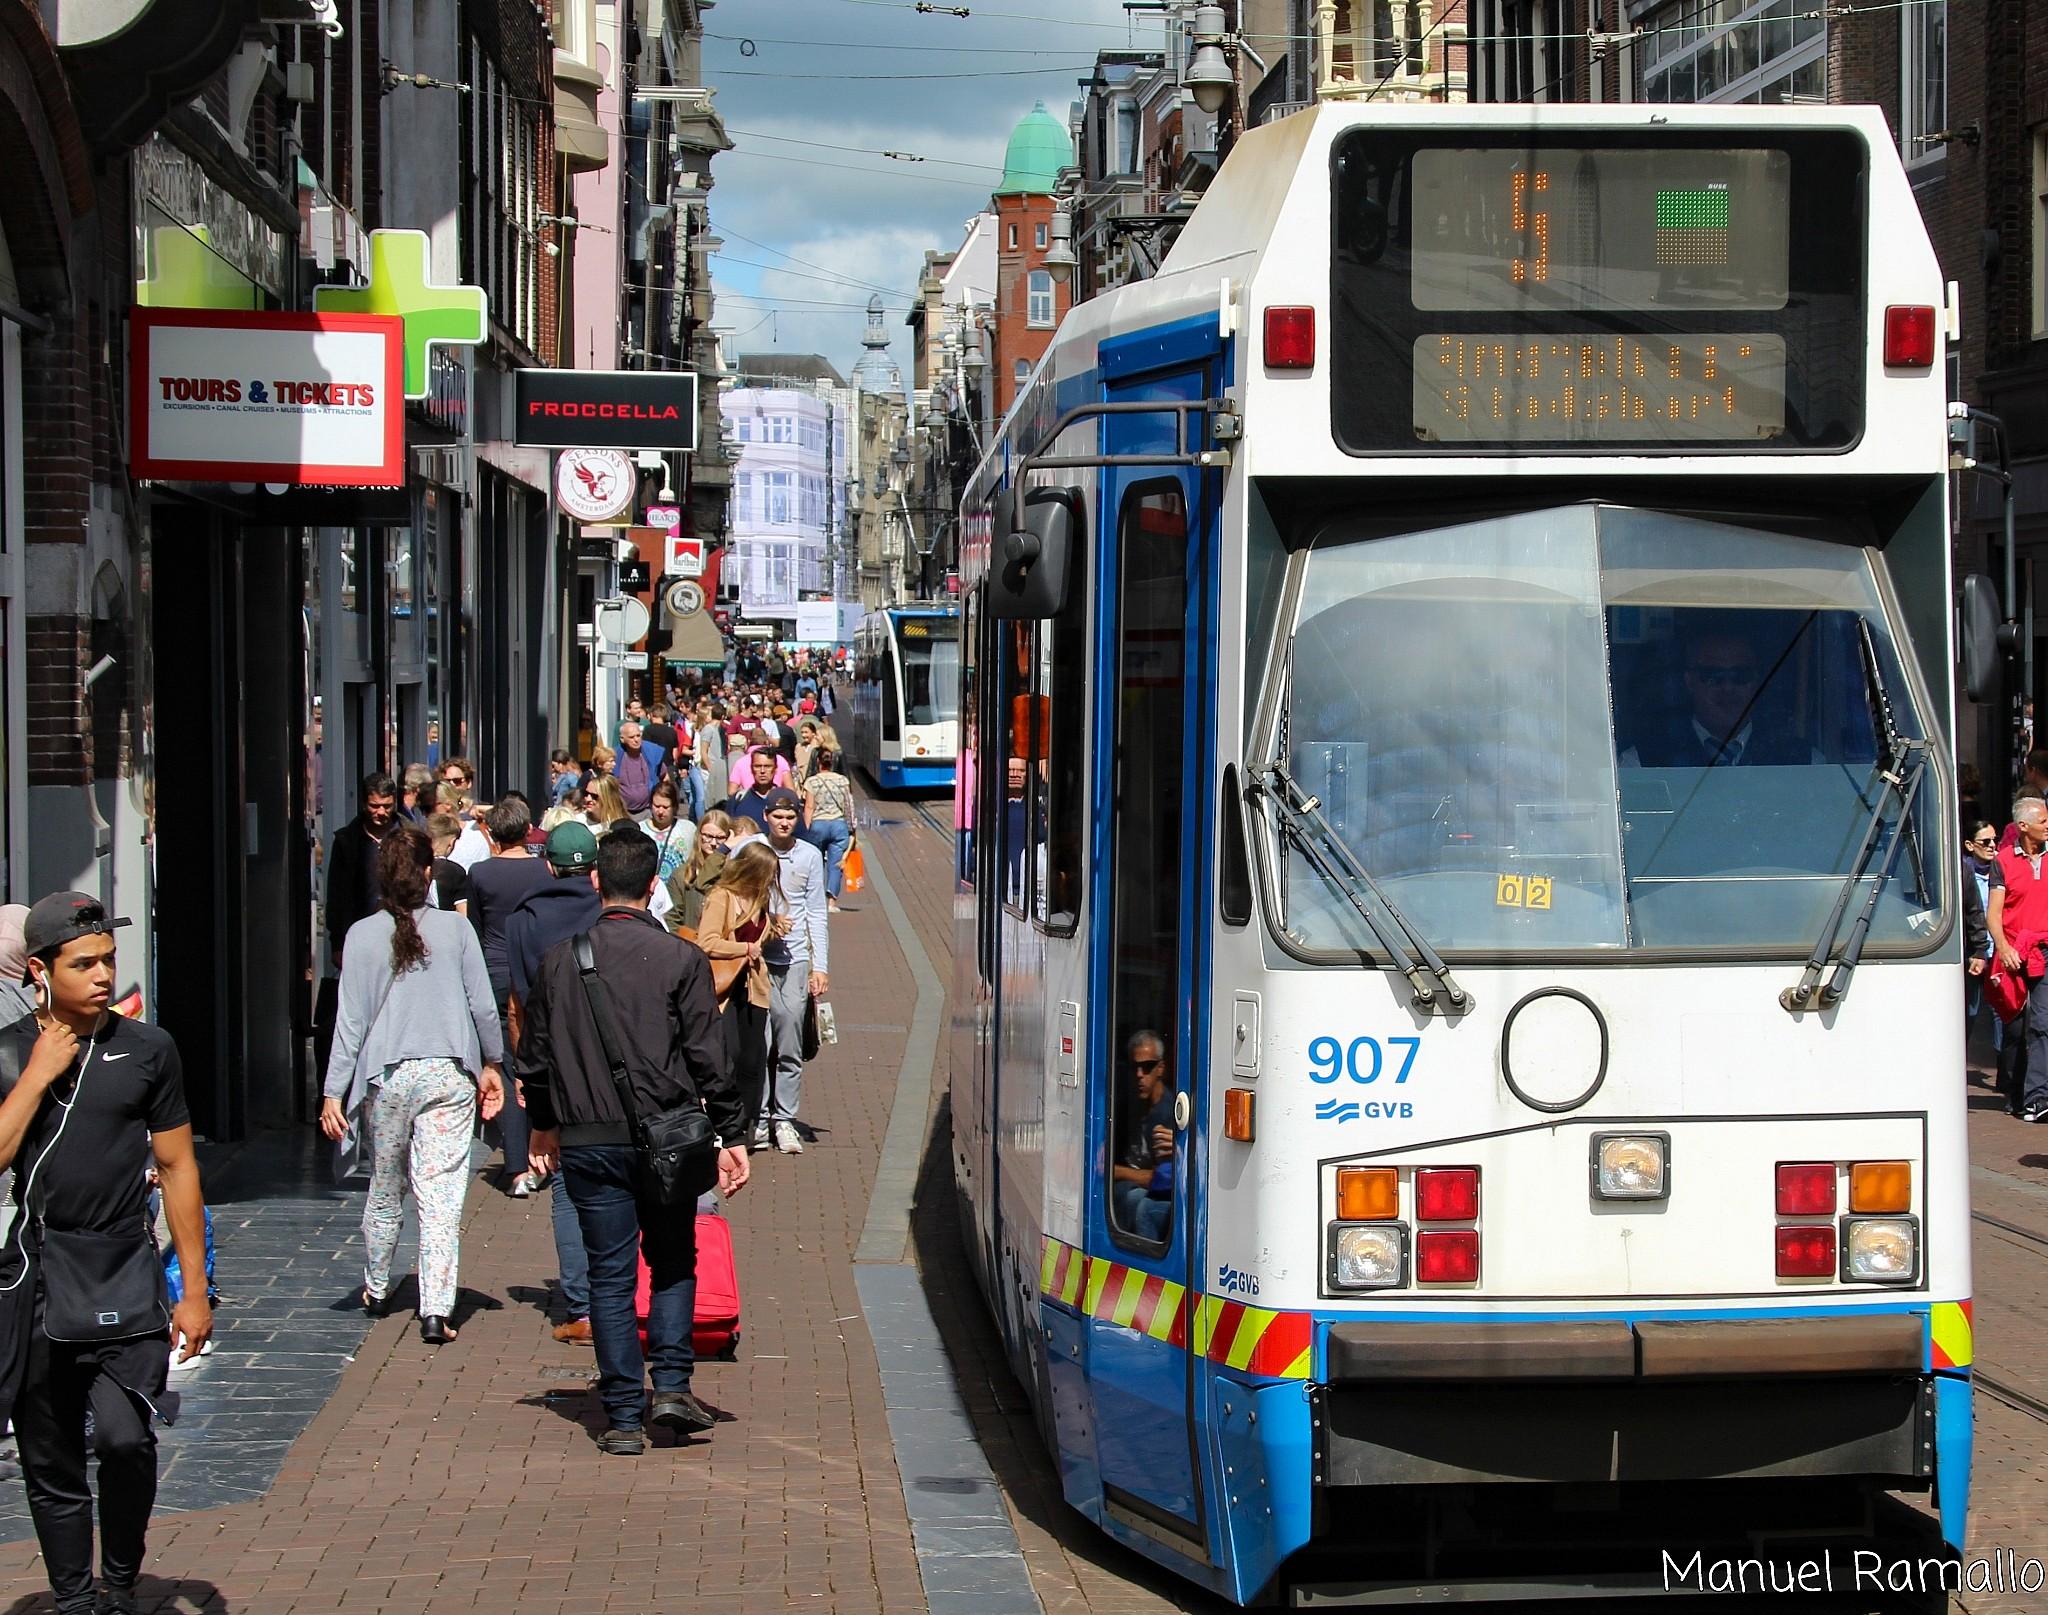 tranvia-calle-amsterdam-holanda-paises-bajos